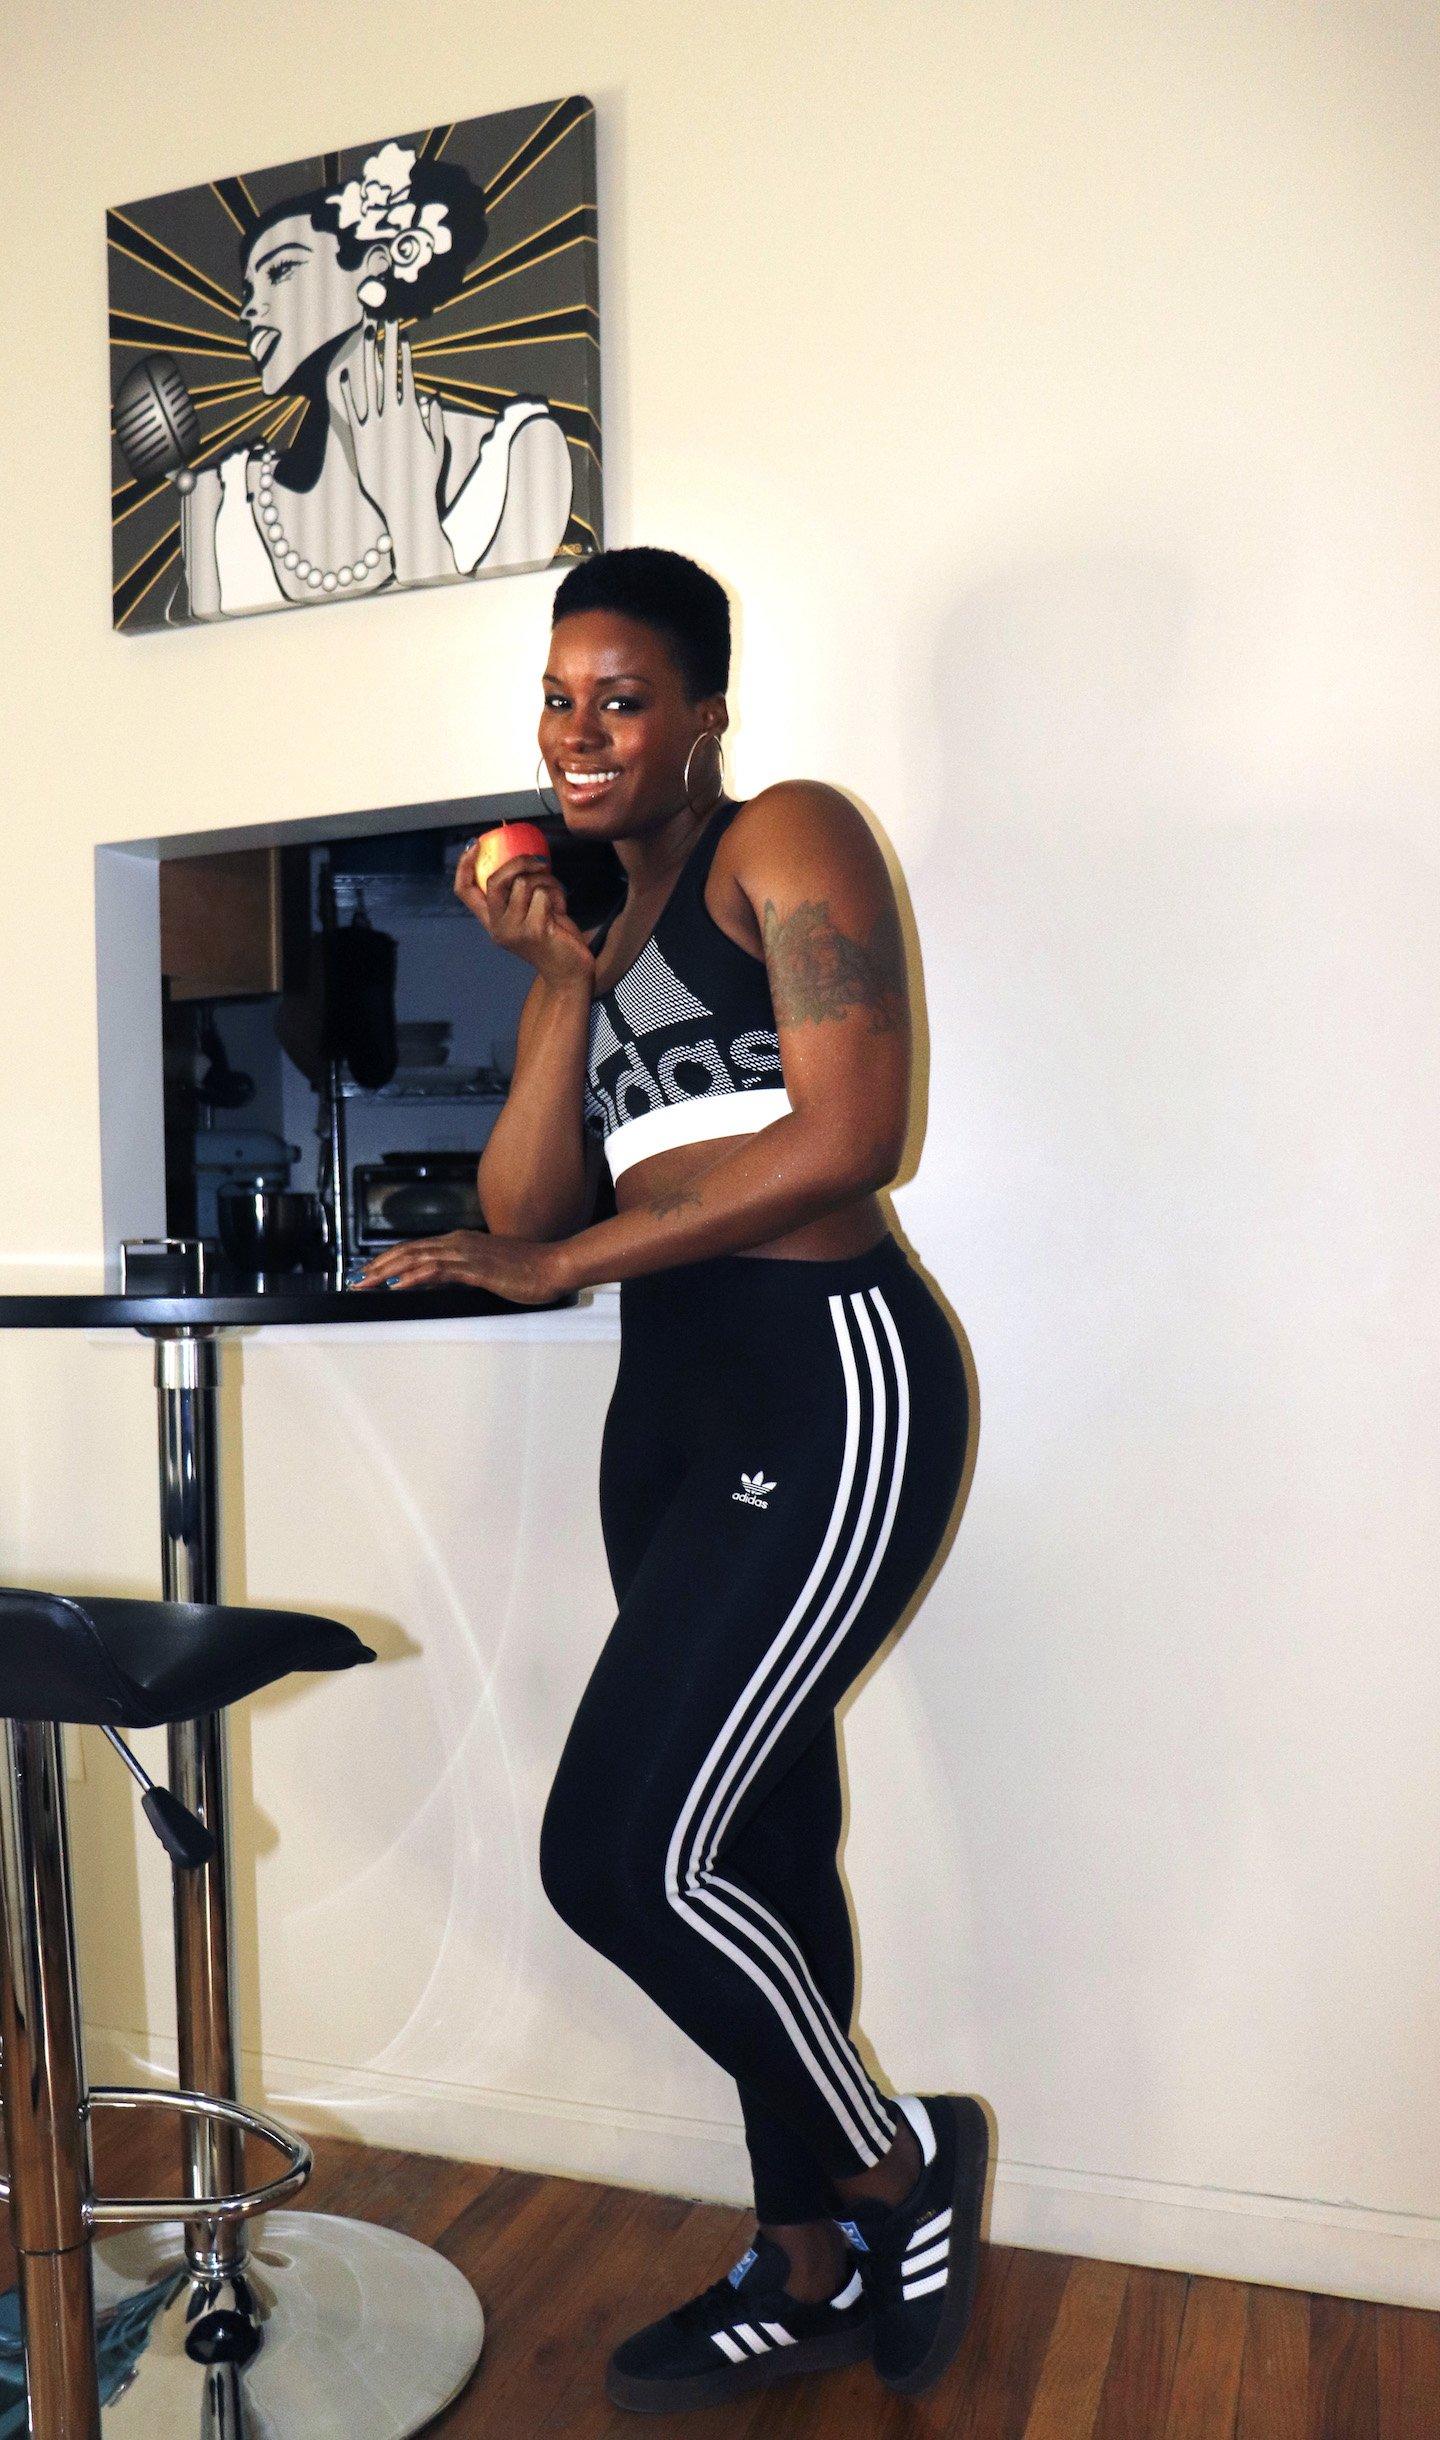 Fitness Journey adidas Workout Gear